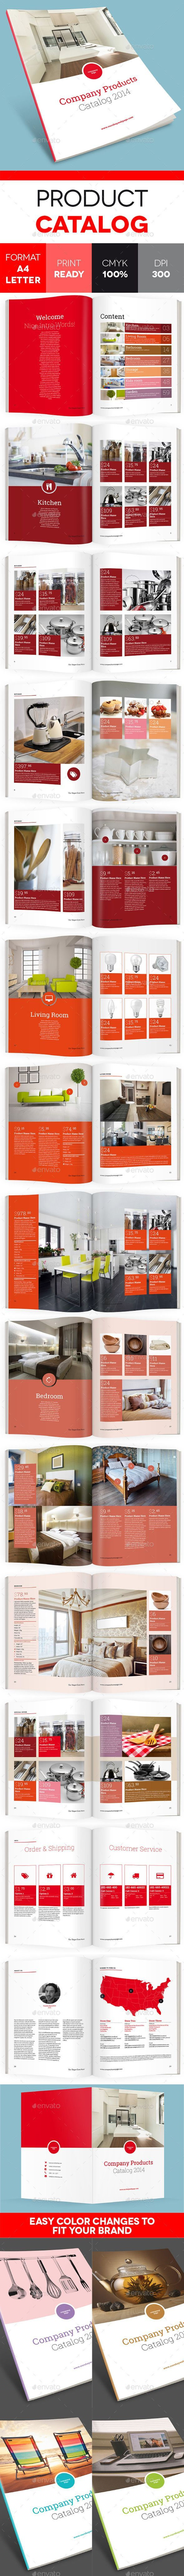 *J* - Flat Product Catalog Brochure - Catalogs Brochures: